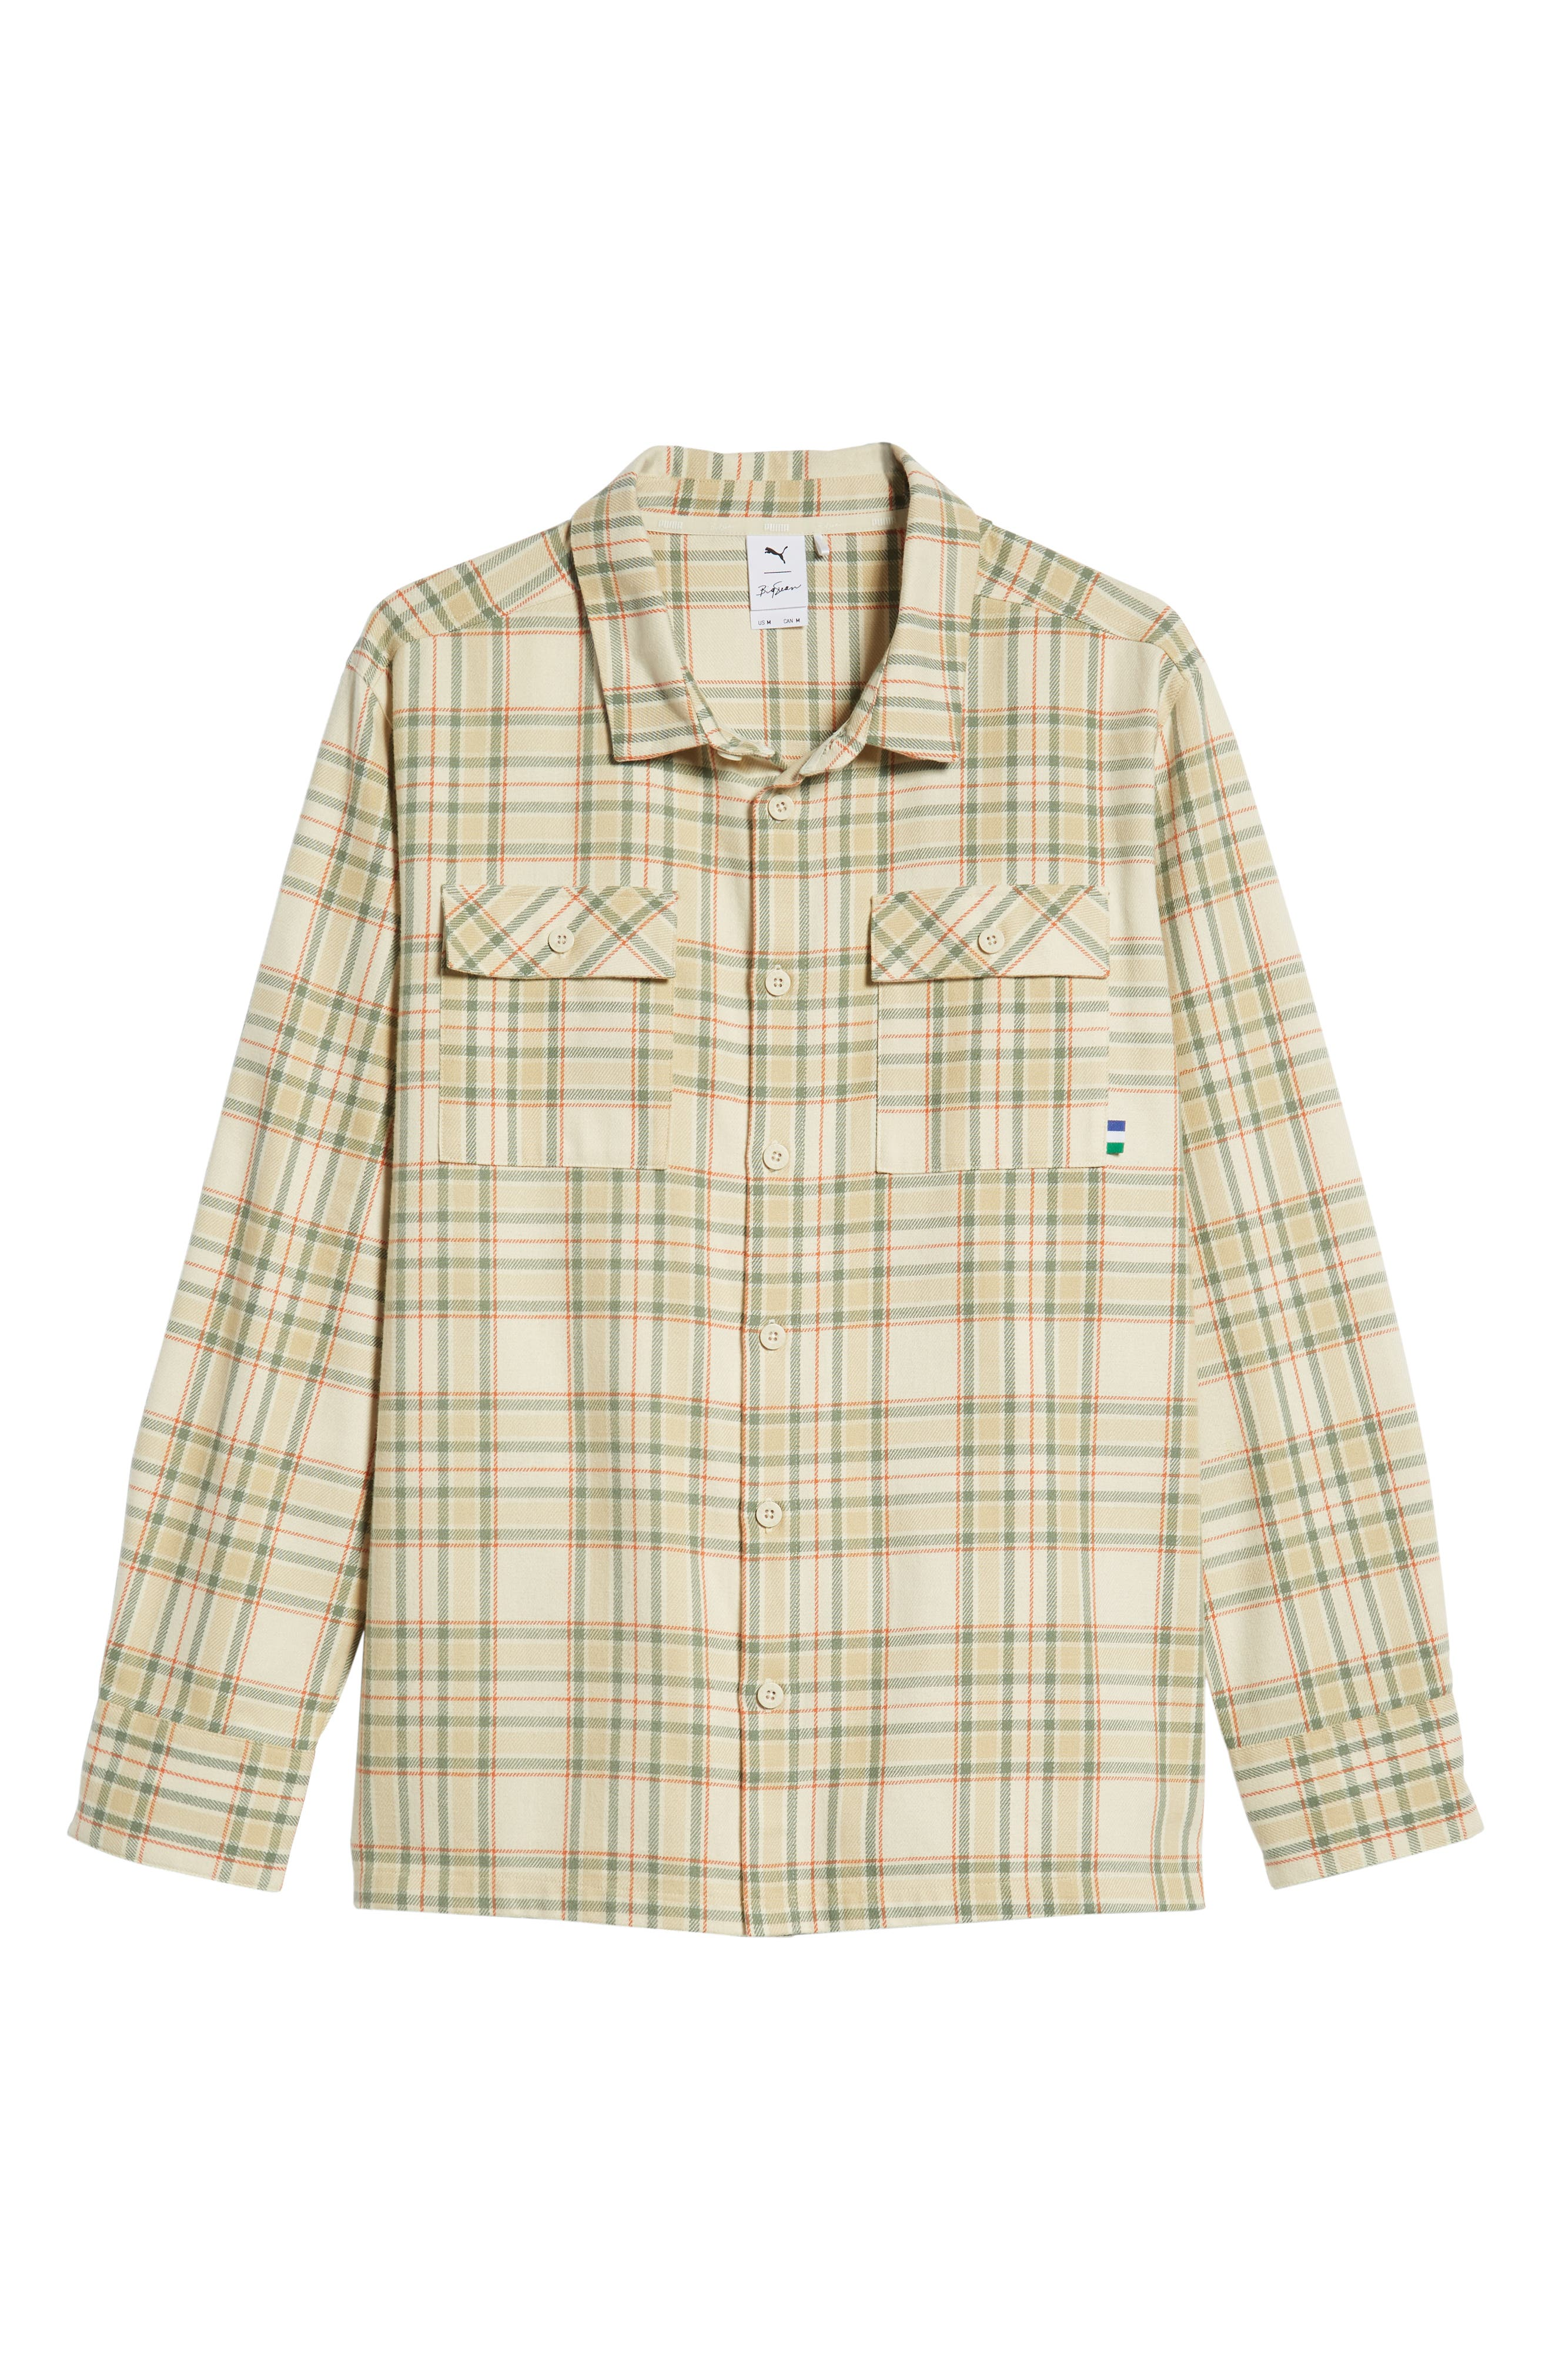 PUMA,                             x Big Sean Check Shirt,                             Alternate thumbnail 6, color,                             100